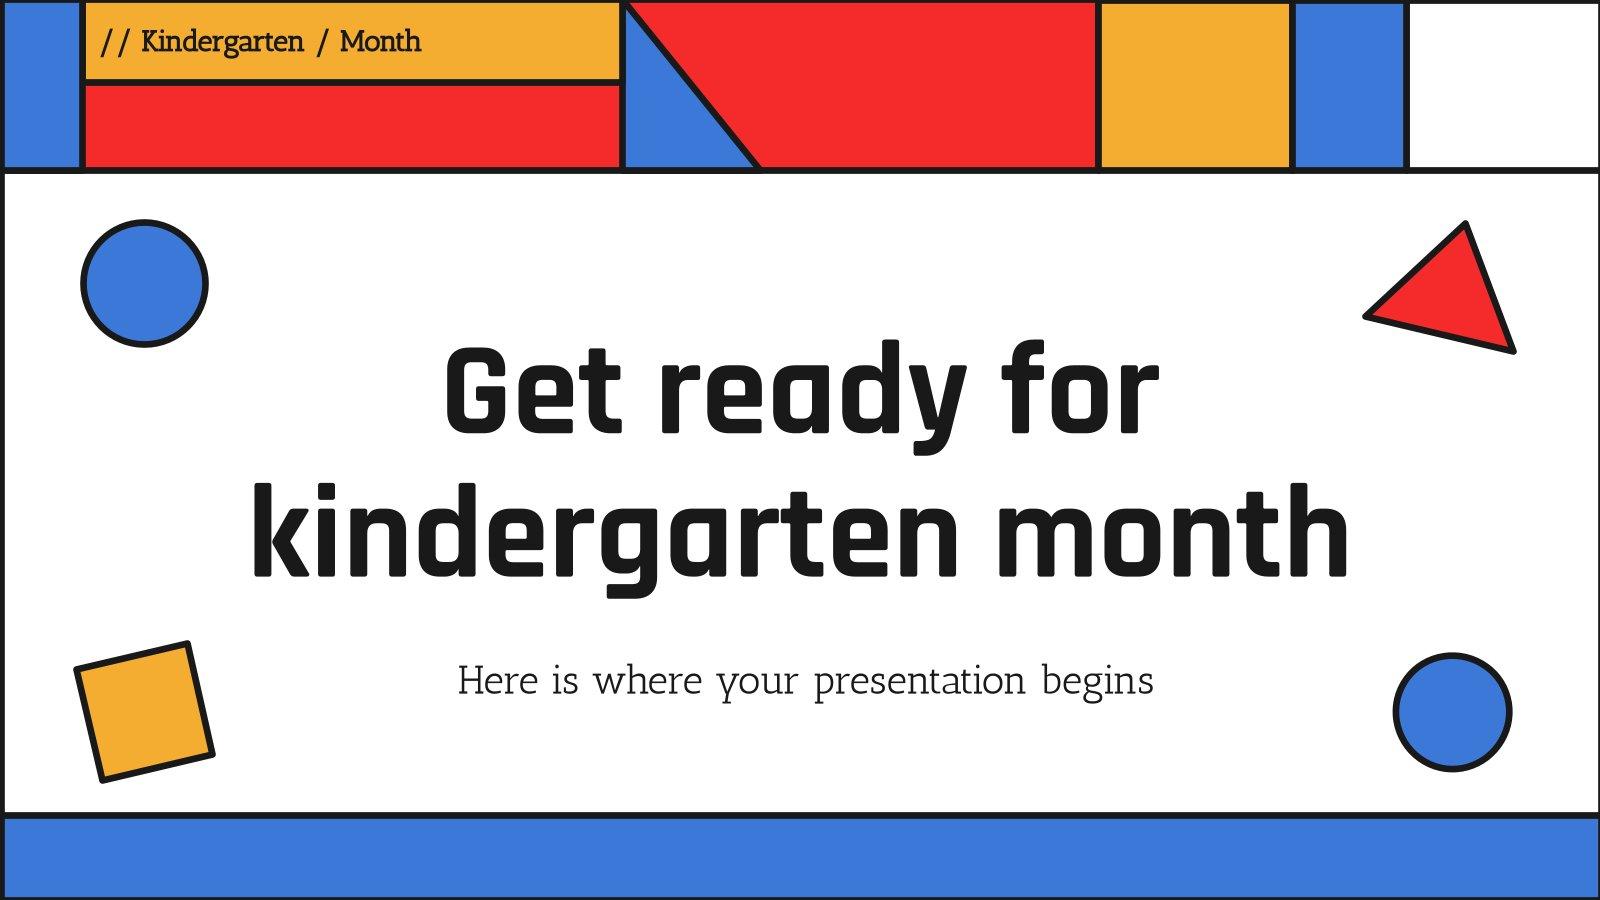 Get Ready for Kindergarten Month presentation template